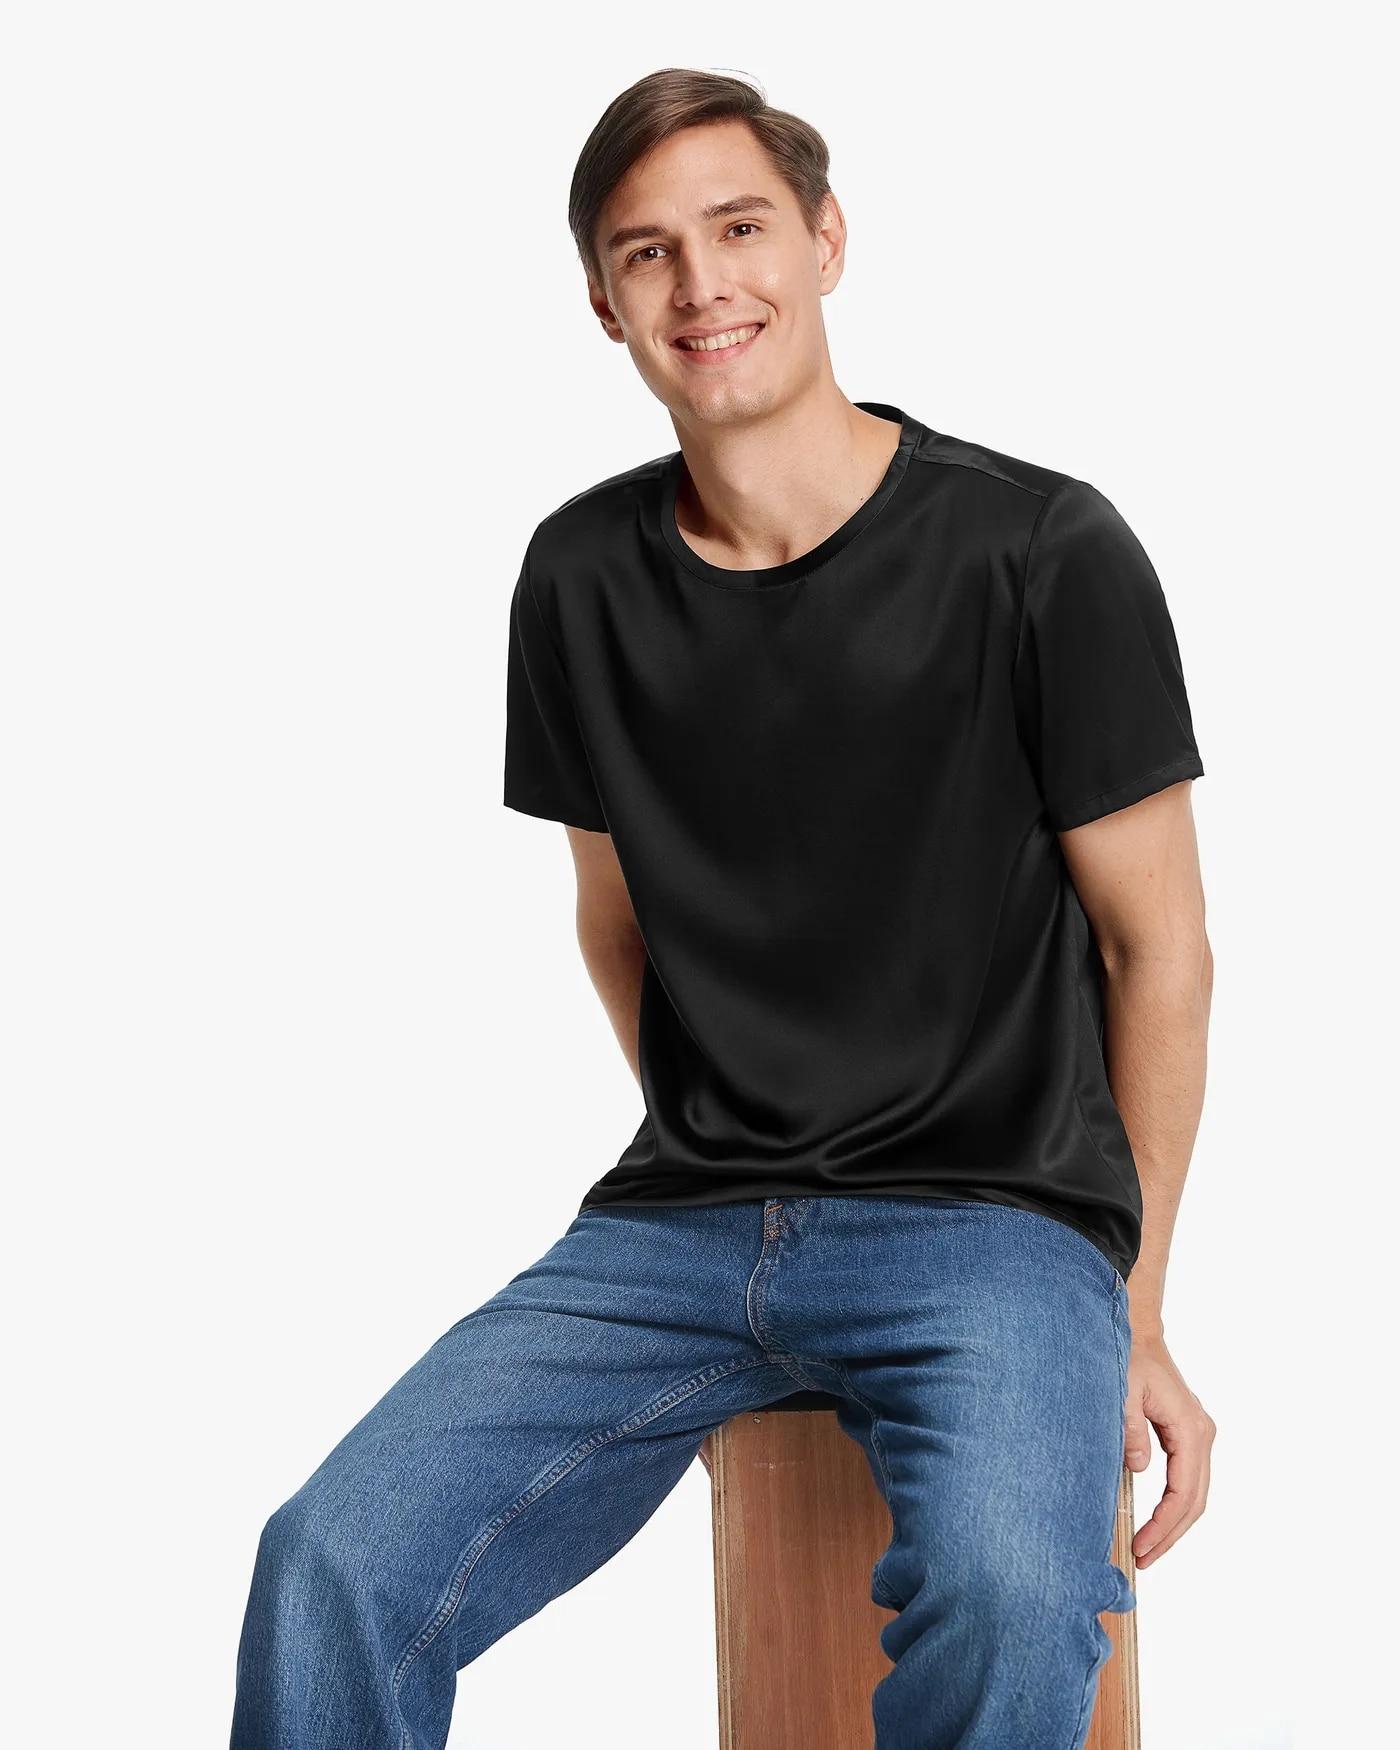 Short-Sleeved Round Neck Silk Mens Tee Fashion O-Neck T Shirt Men Trend Casual Mens T-Shirt